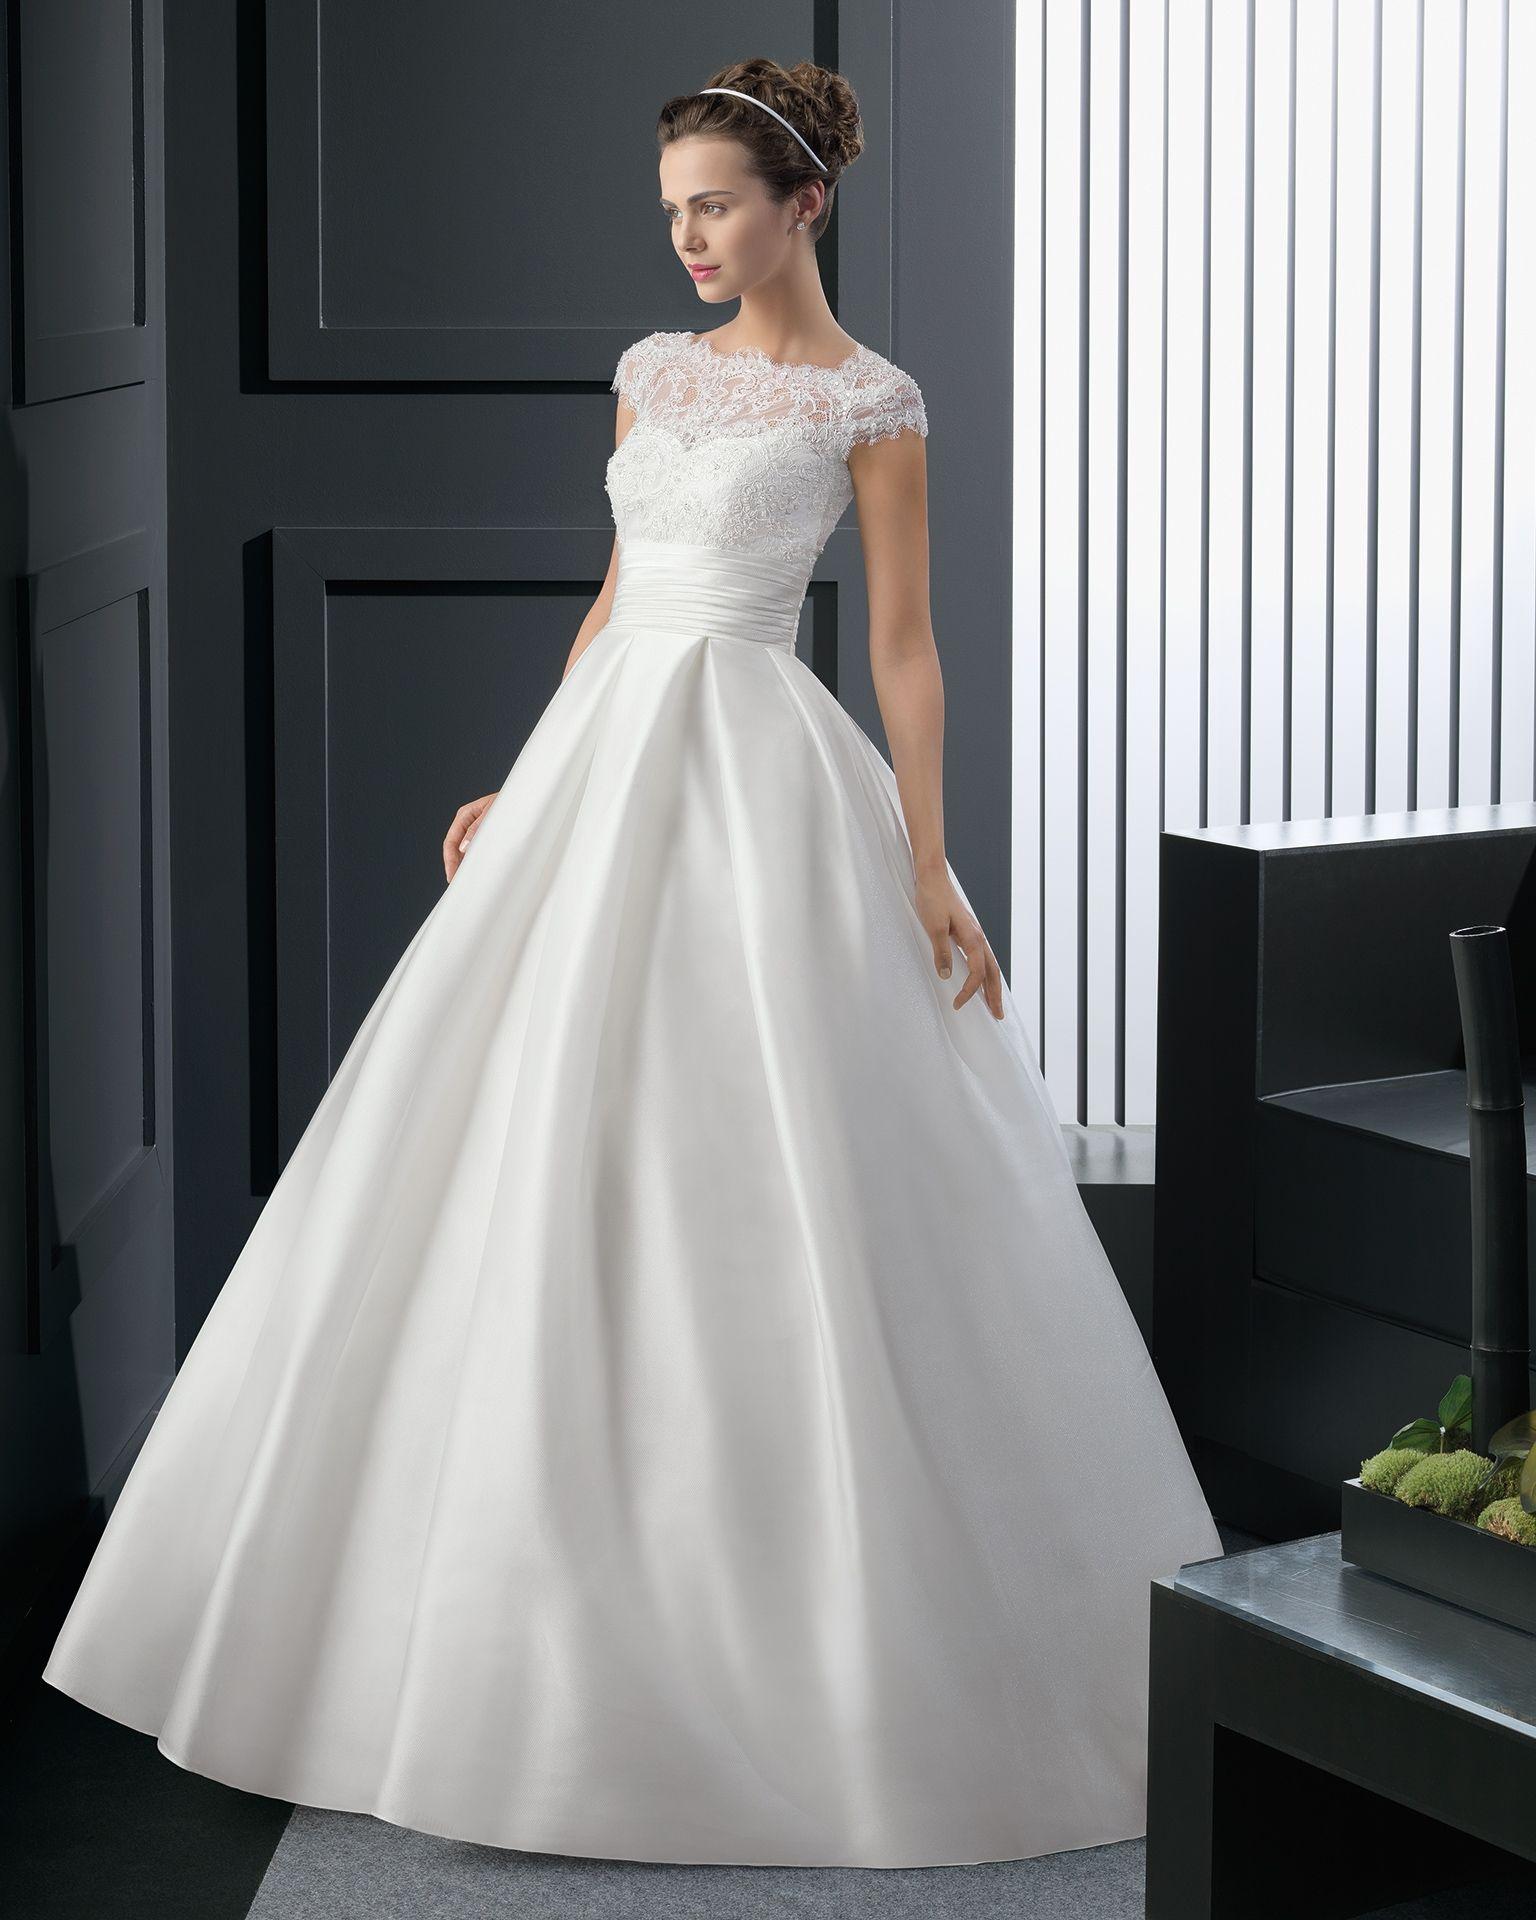 47 8A143 RHEA - Vestido de Novia - Rosa Clará | Vestido | Pinterest ...